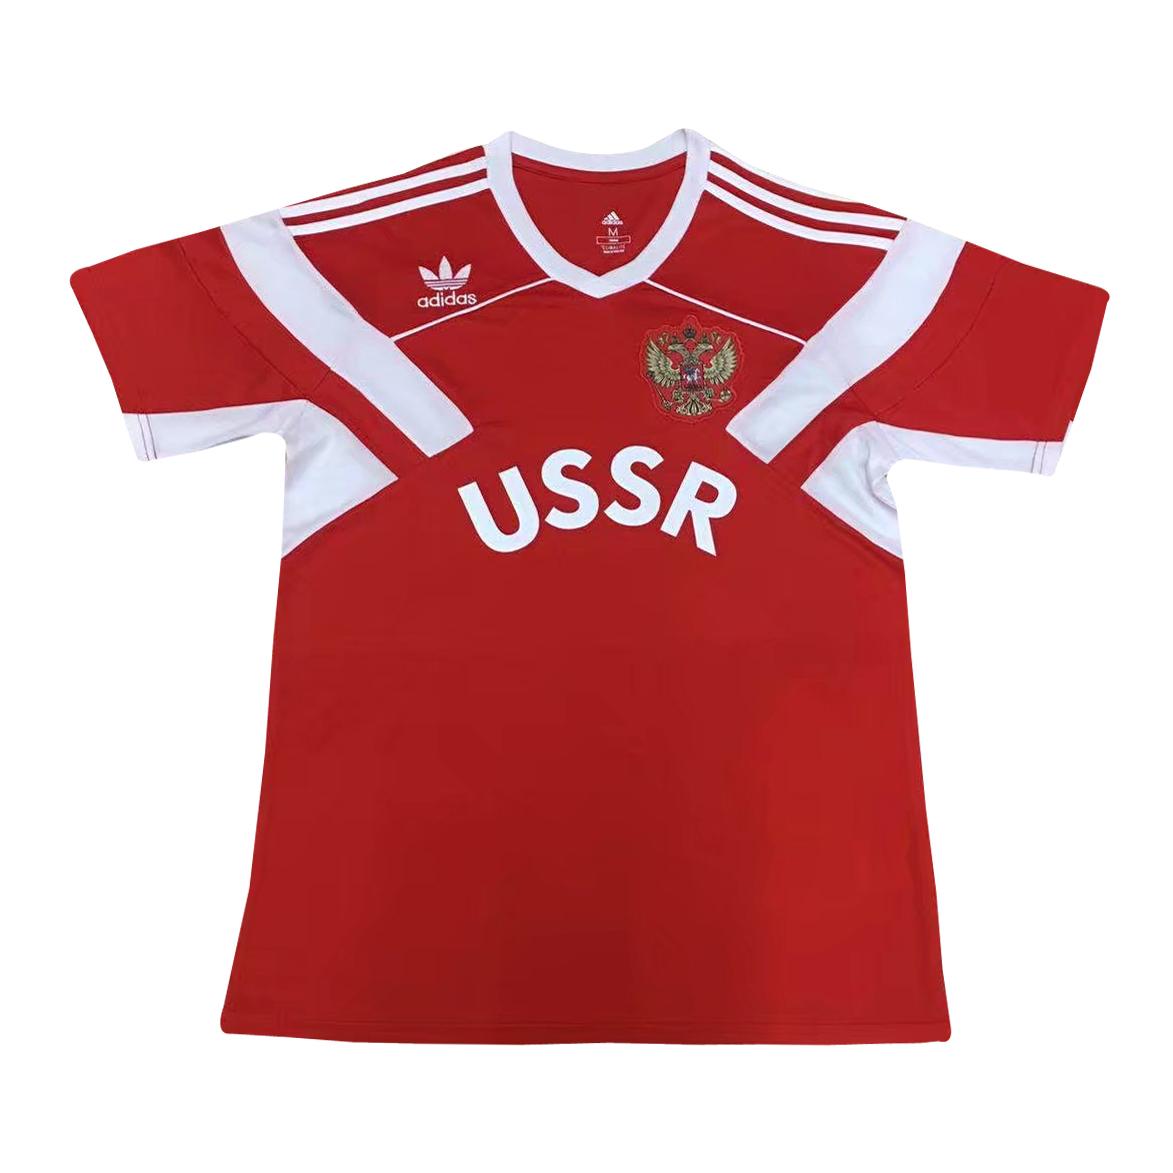 2e7b55ba574 US  15.8 - Russia FIFA World Cup 2018 Home Jersey Men - Special Edition -  www.yajerseyclub.com